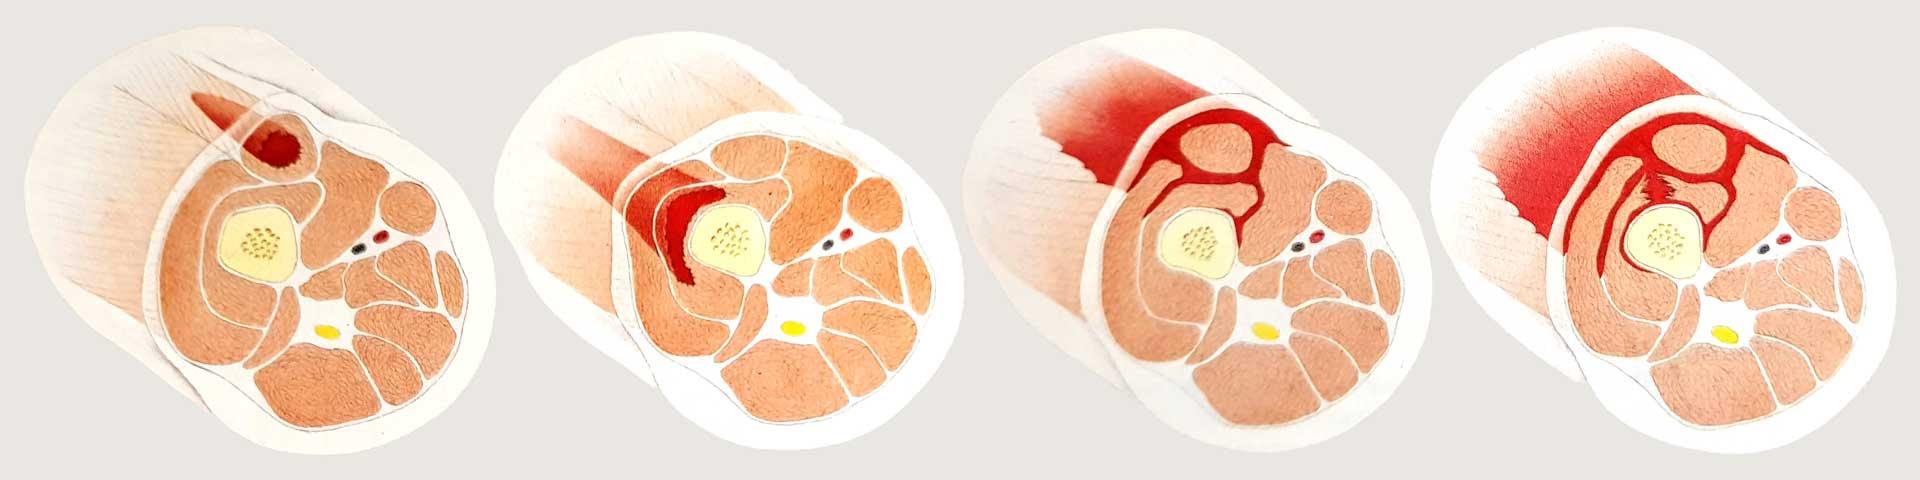 Графика изобразяваща схематично Superficial Intramuscilar Haematoma